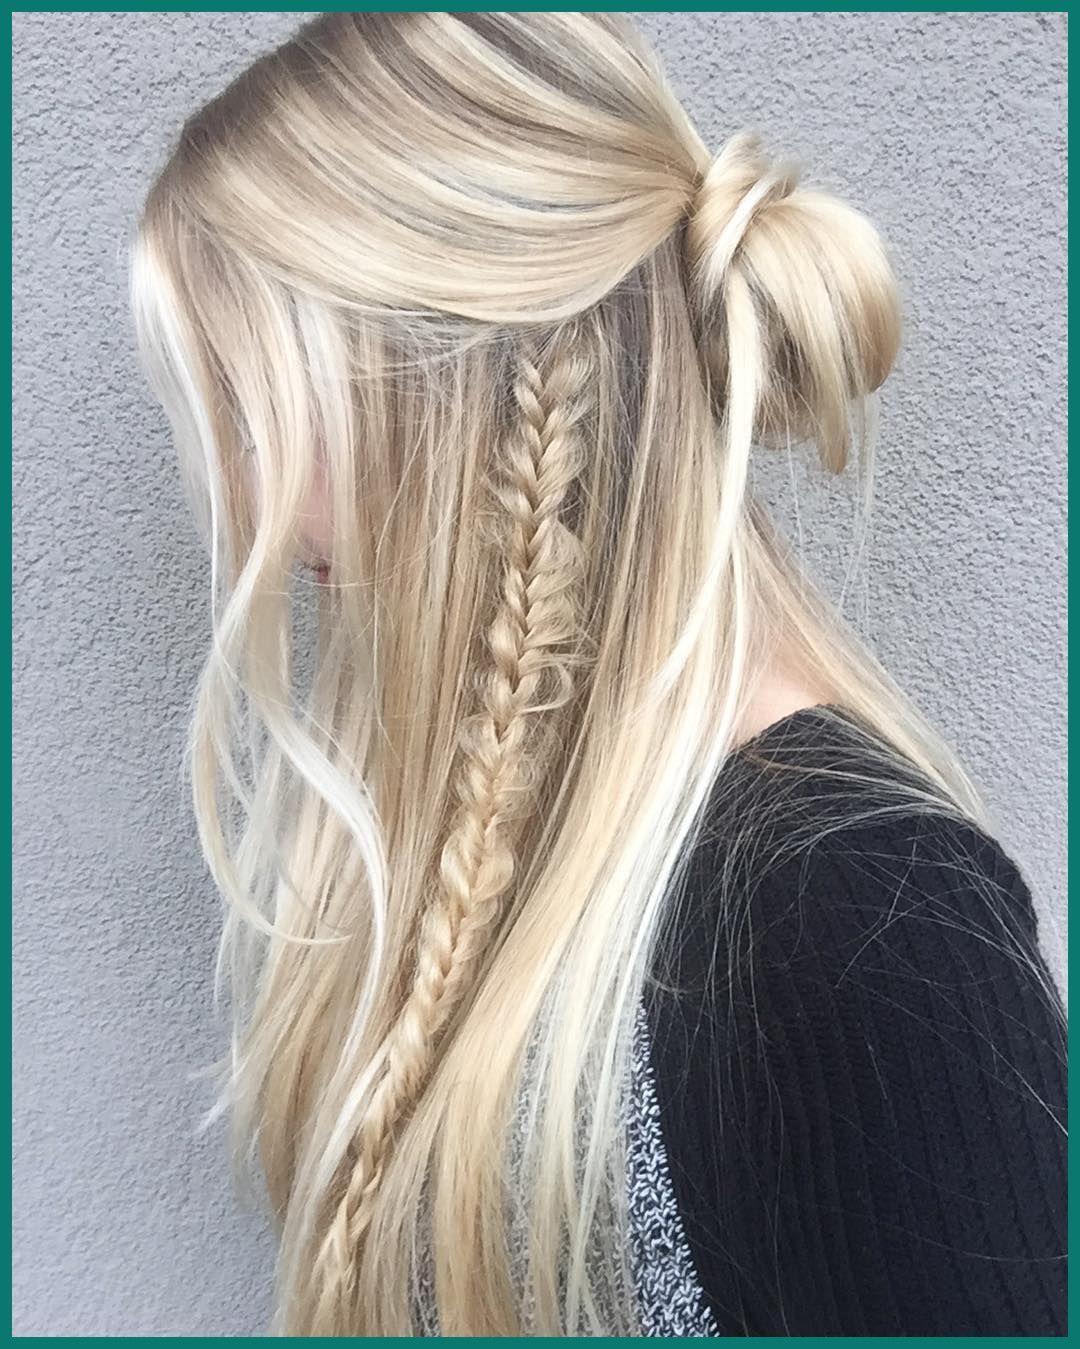 Easy Cute Hairstyles Down Everyday In 2020 Down Hairstyles Long Hair Styles Pretty Hairstyles